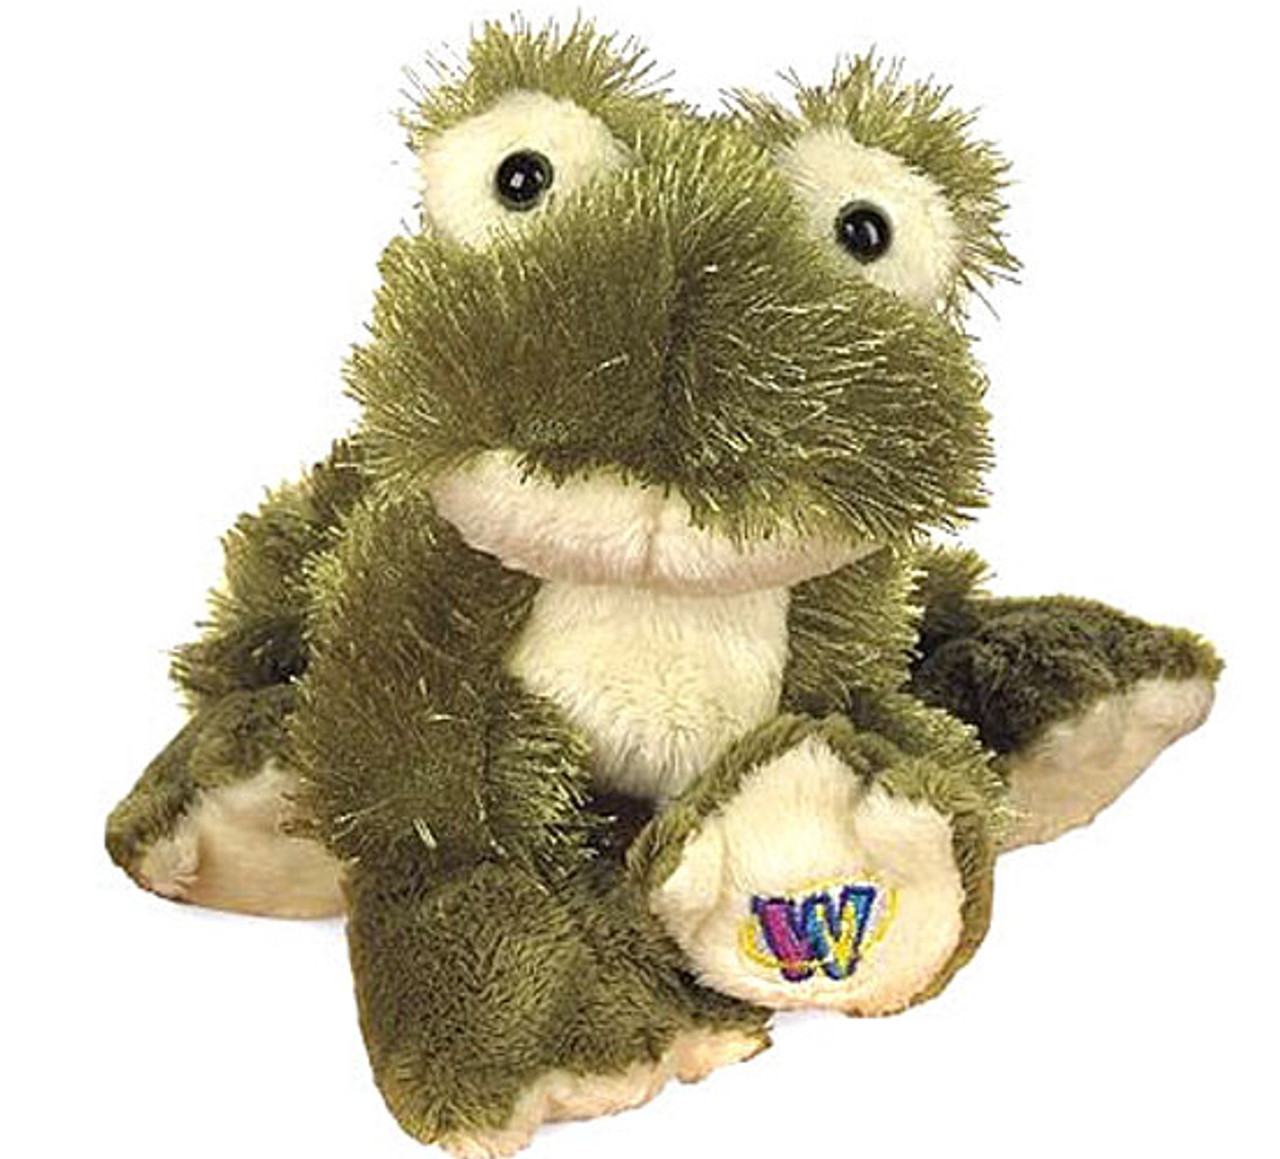 Webkinz Lil' Kinz Frog Plush